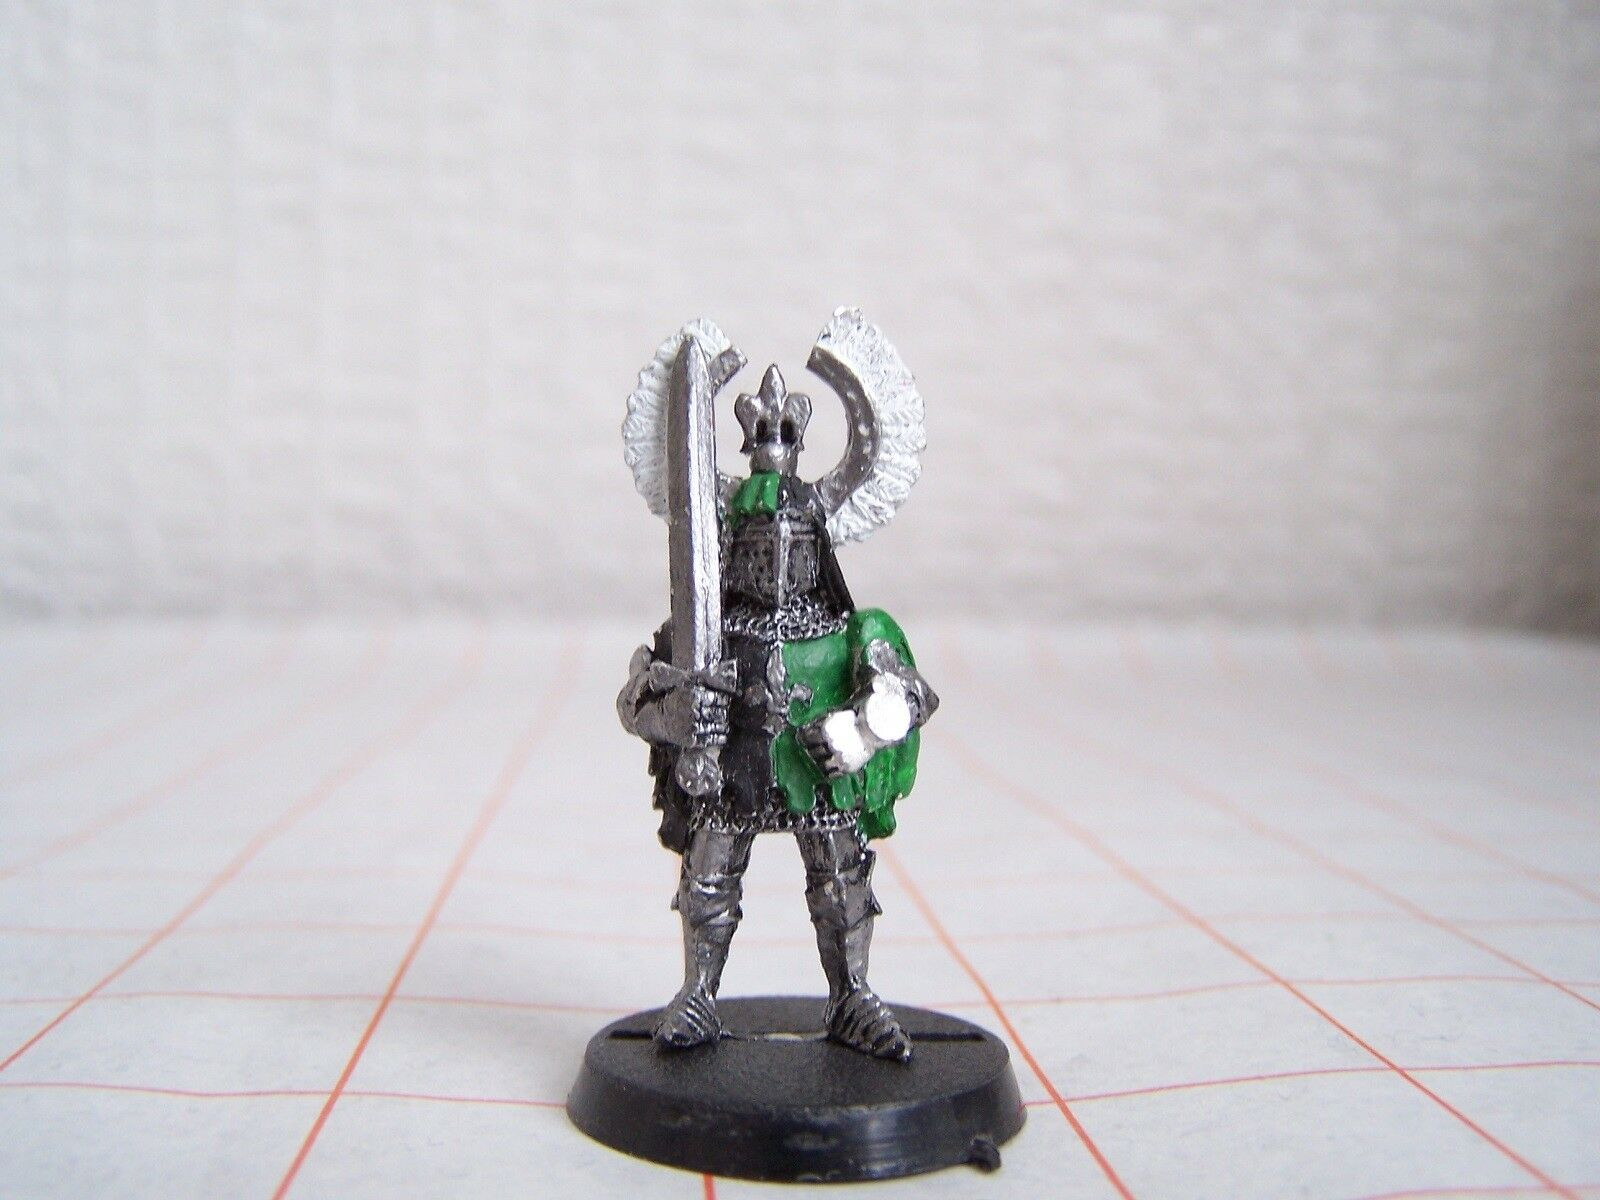 Warhammer Bretonnian Questing Knight Hero on Foot (OOP)